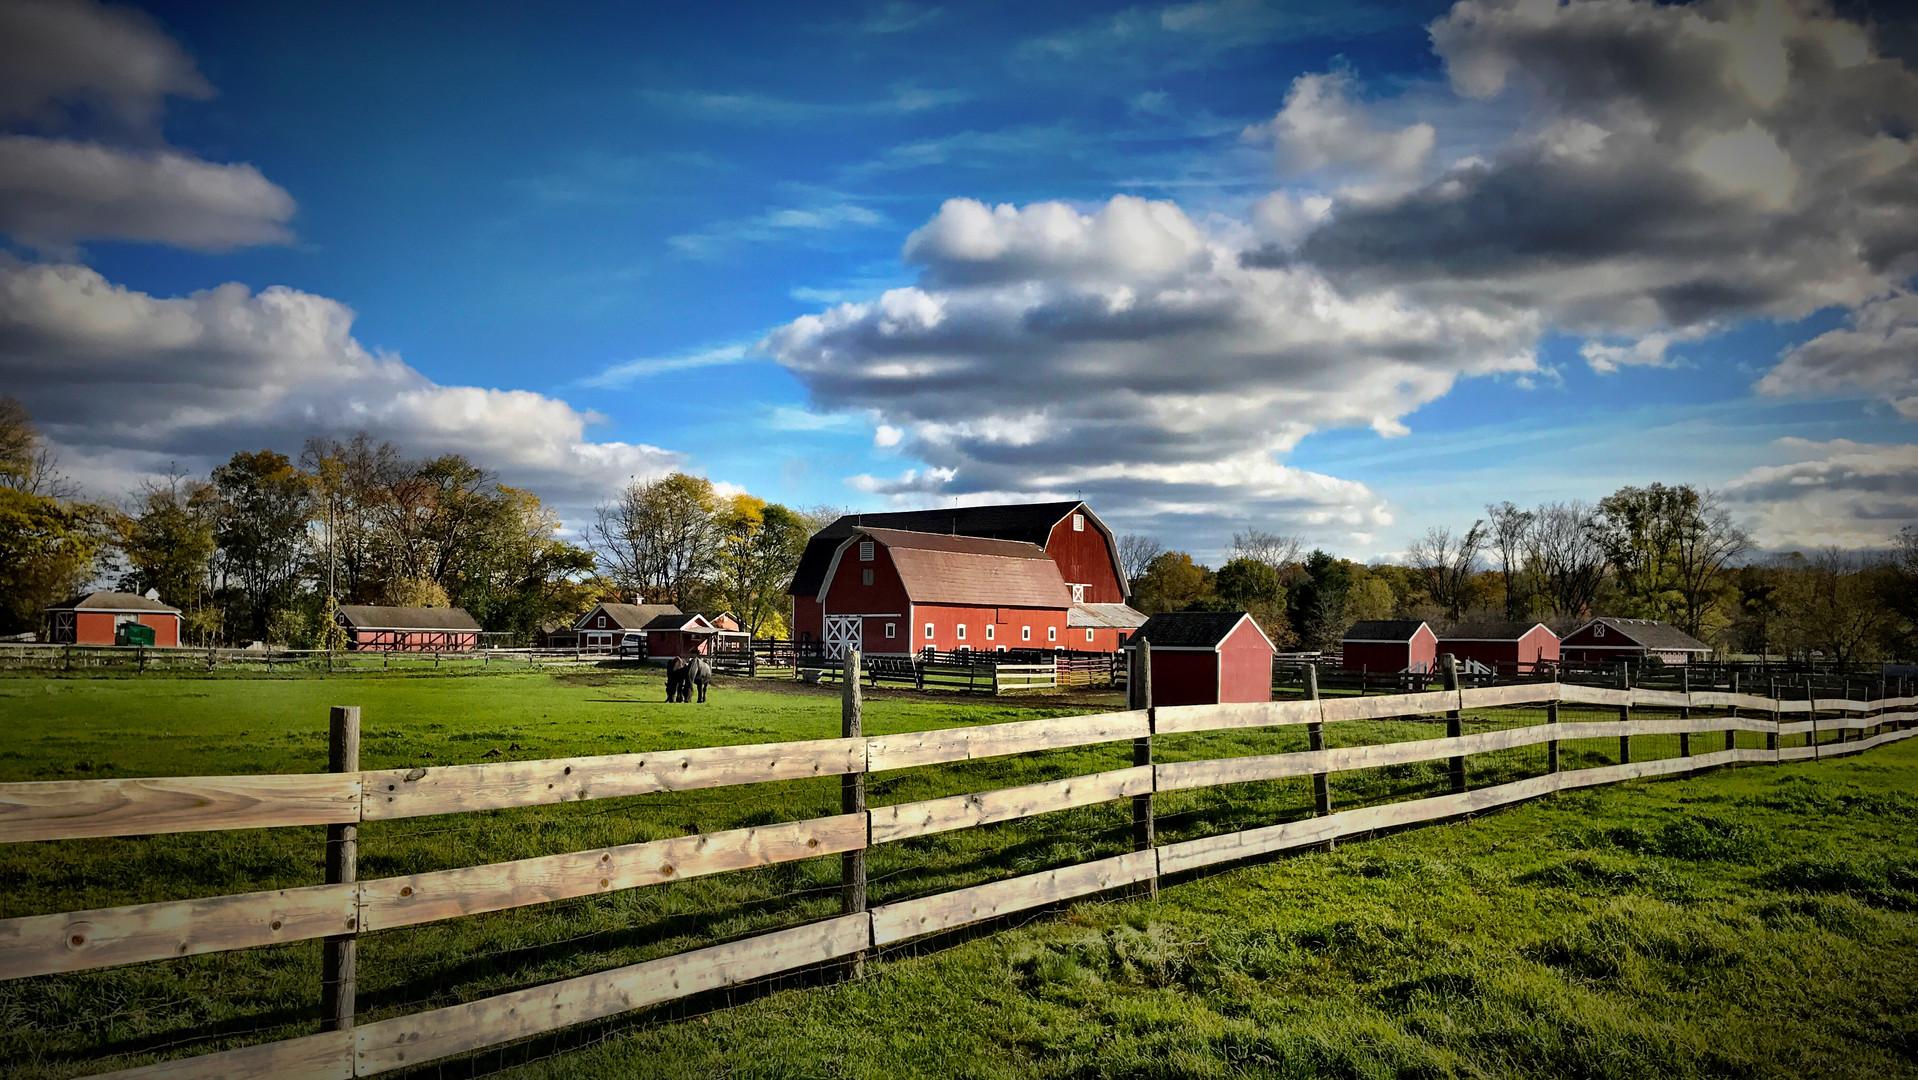 Barn Blue Sky.JPG